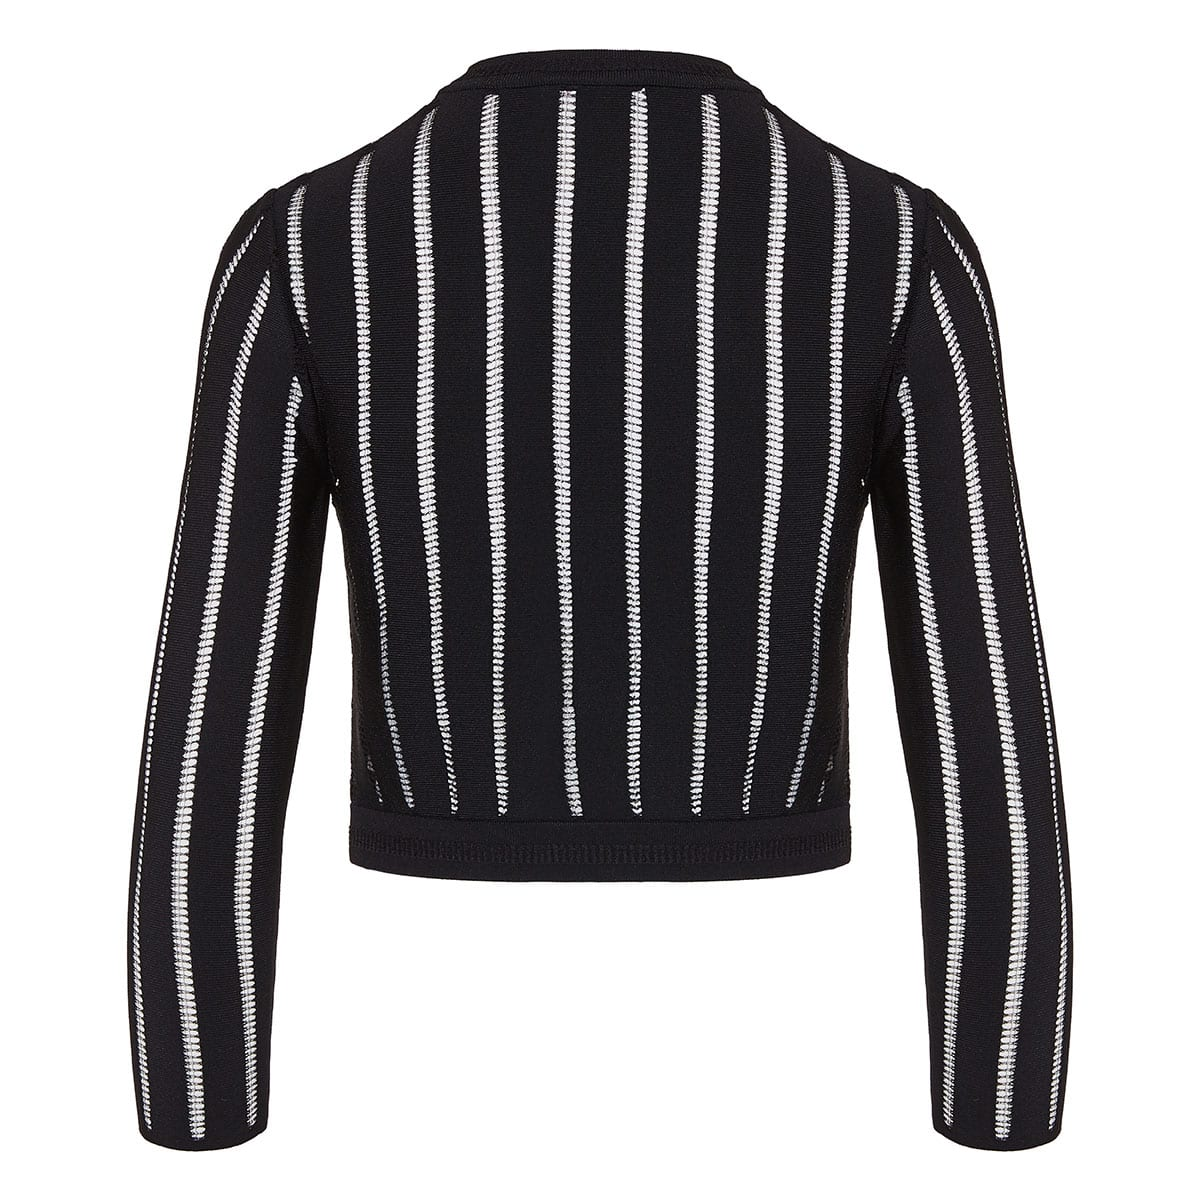 Striped cropped cardigan